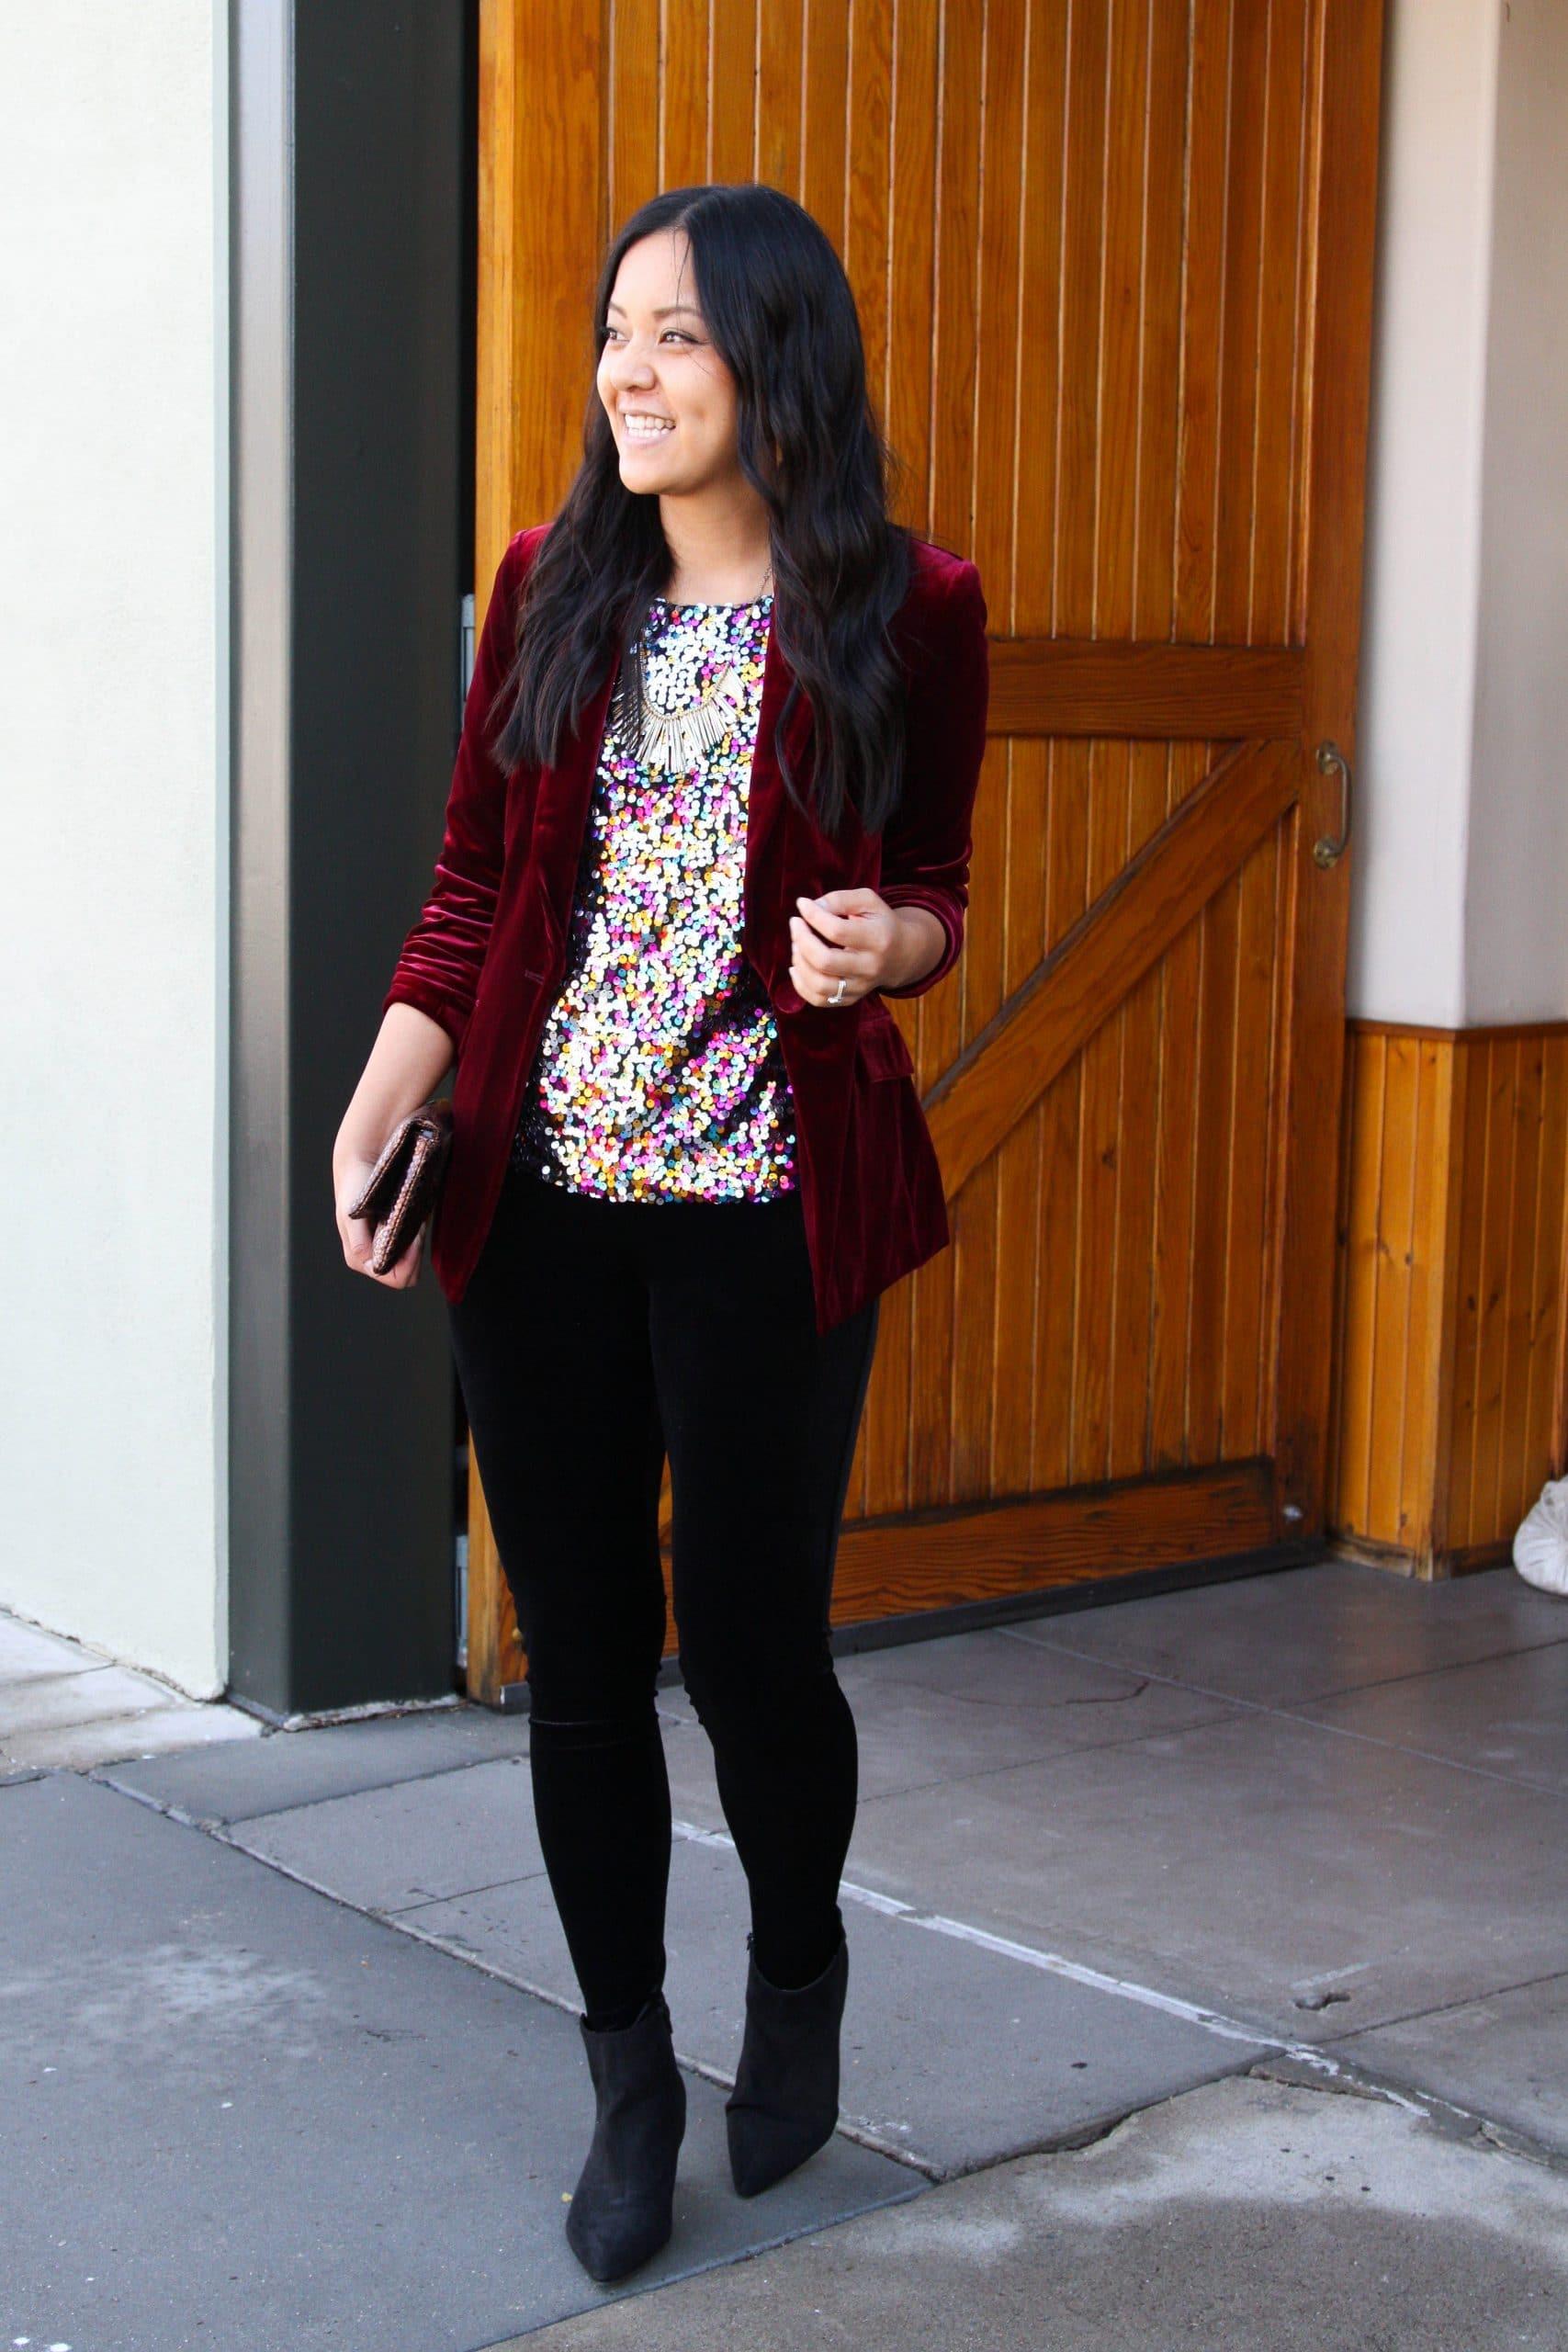 Colored Sequins Top Maroon Velvet Blazer Black Velvet Leggings Black Booties Outfit 3 Putting Me Together